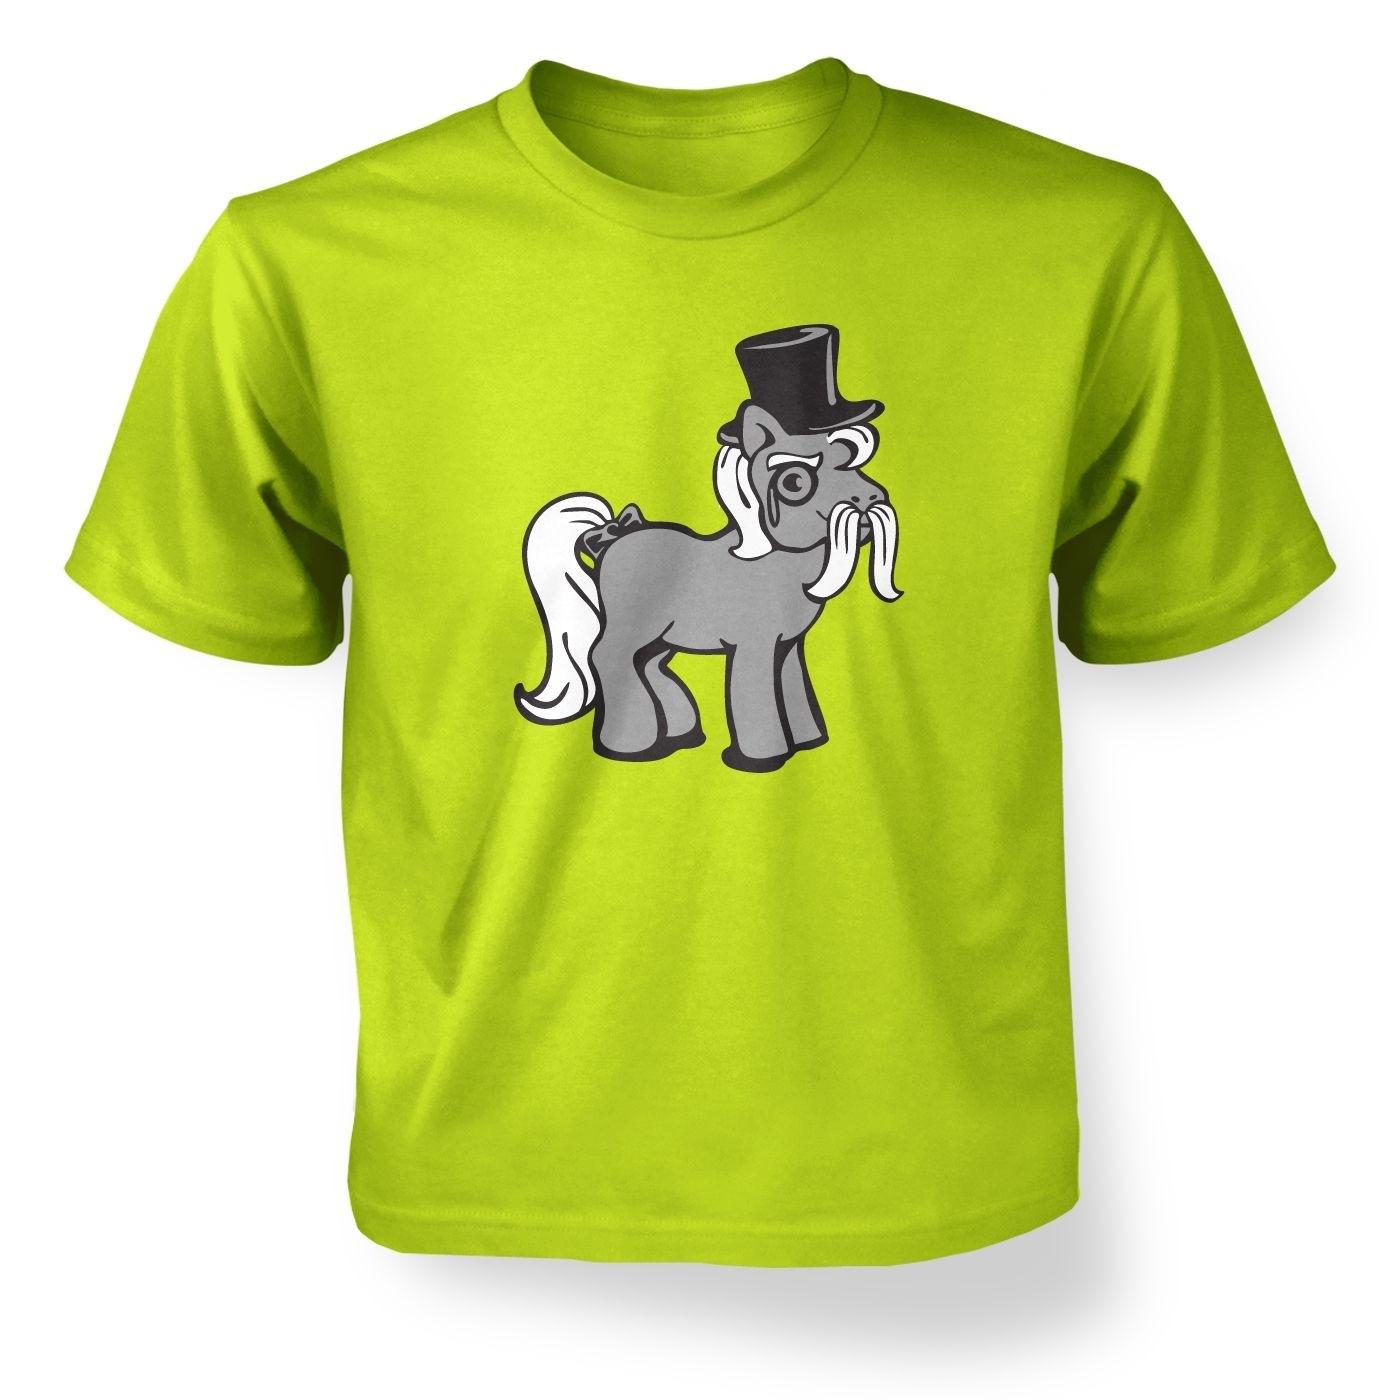 Top Hat Pony Kids' T-shirt